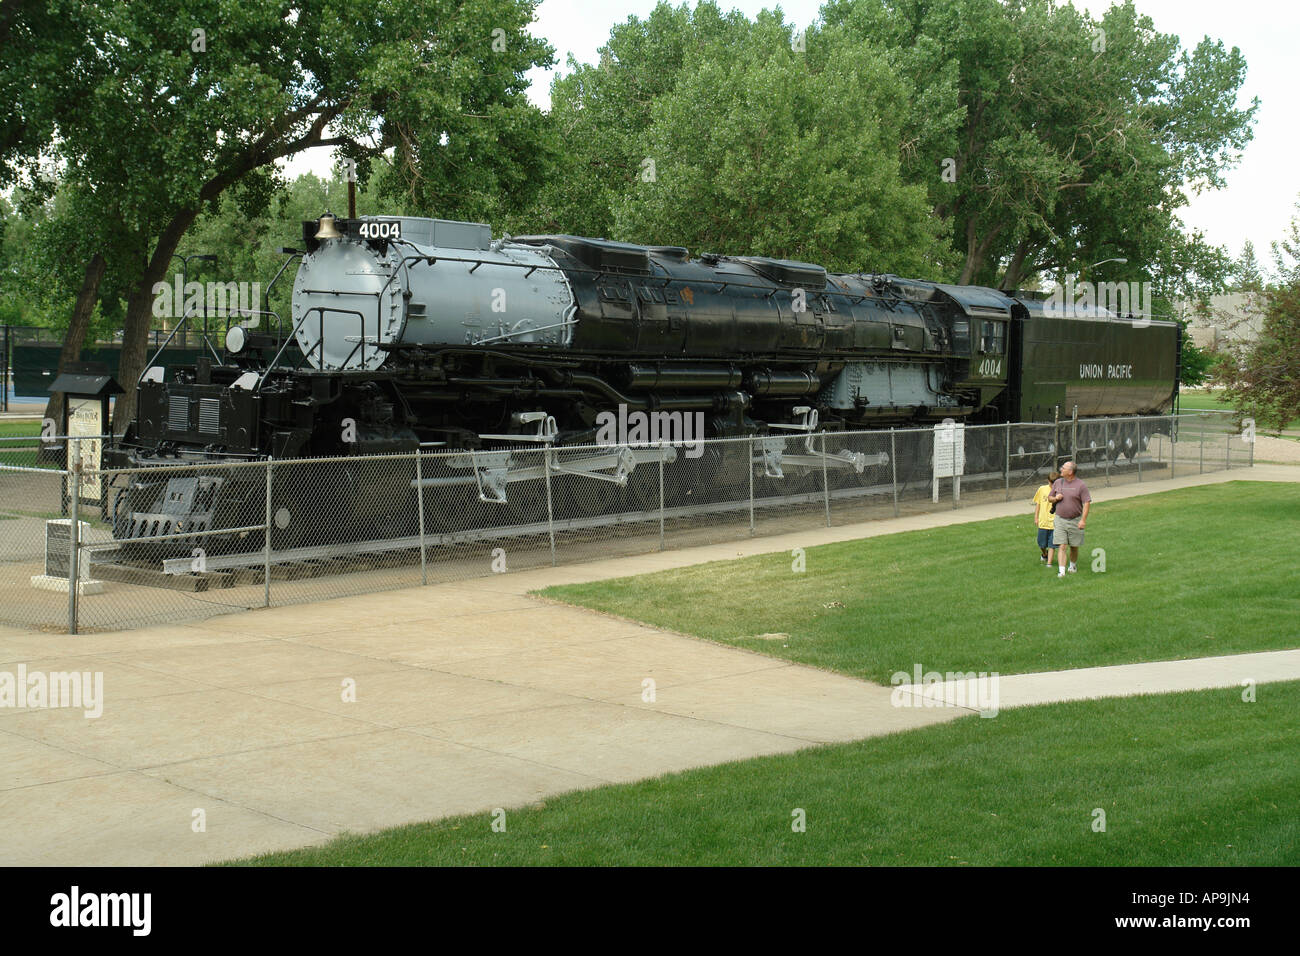 AJD50309, Cheyenne, WY, Wyoming, Holliday Park, Big Boy steam engine, locomotive - Stock Image